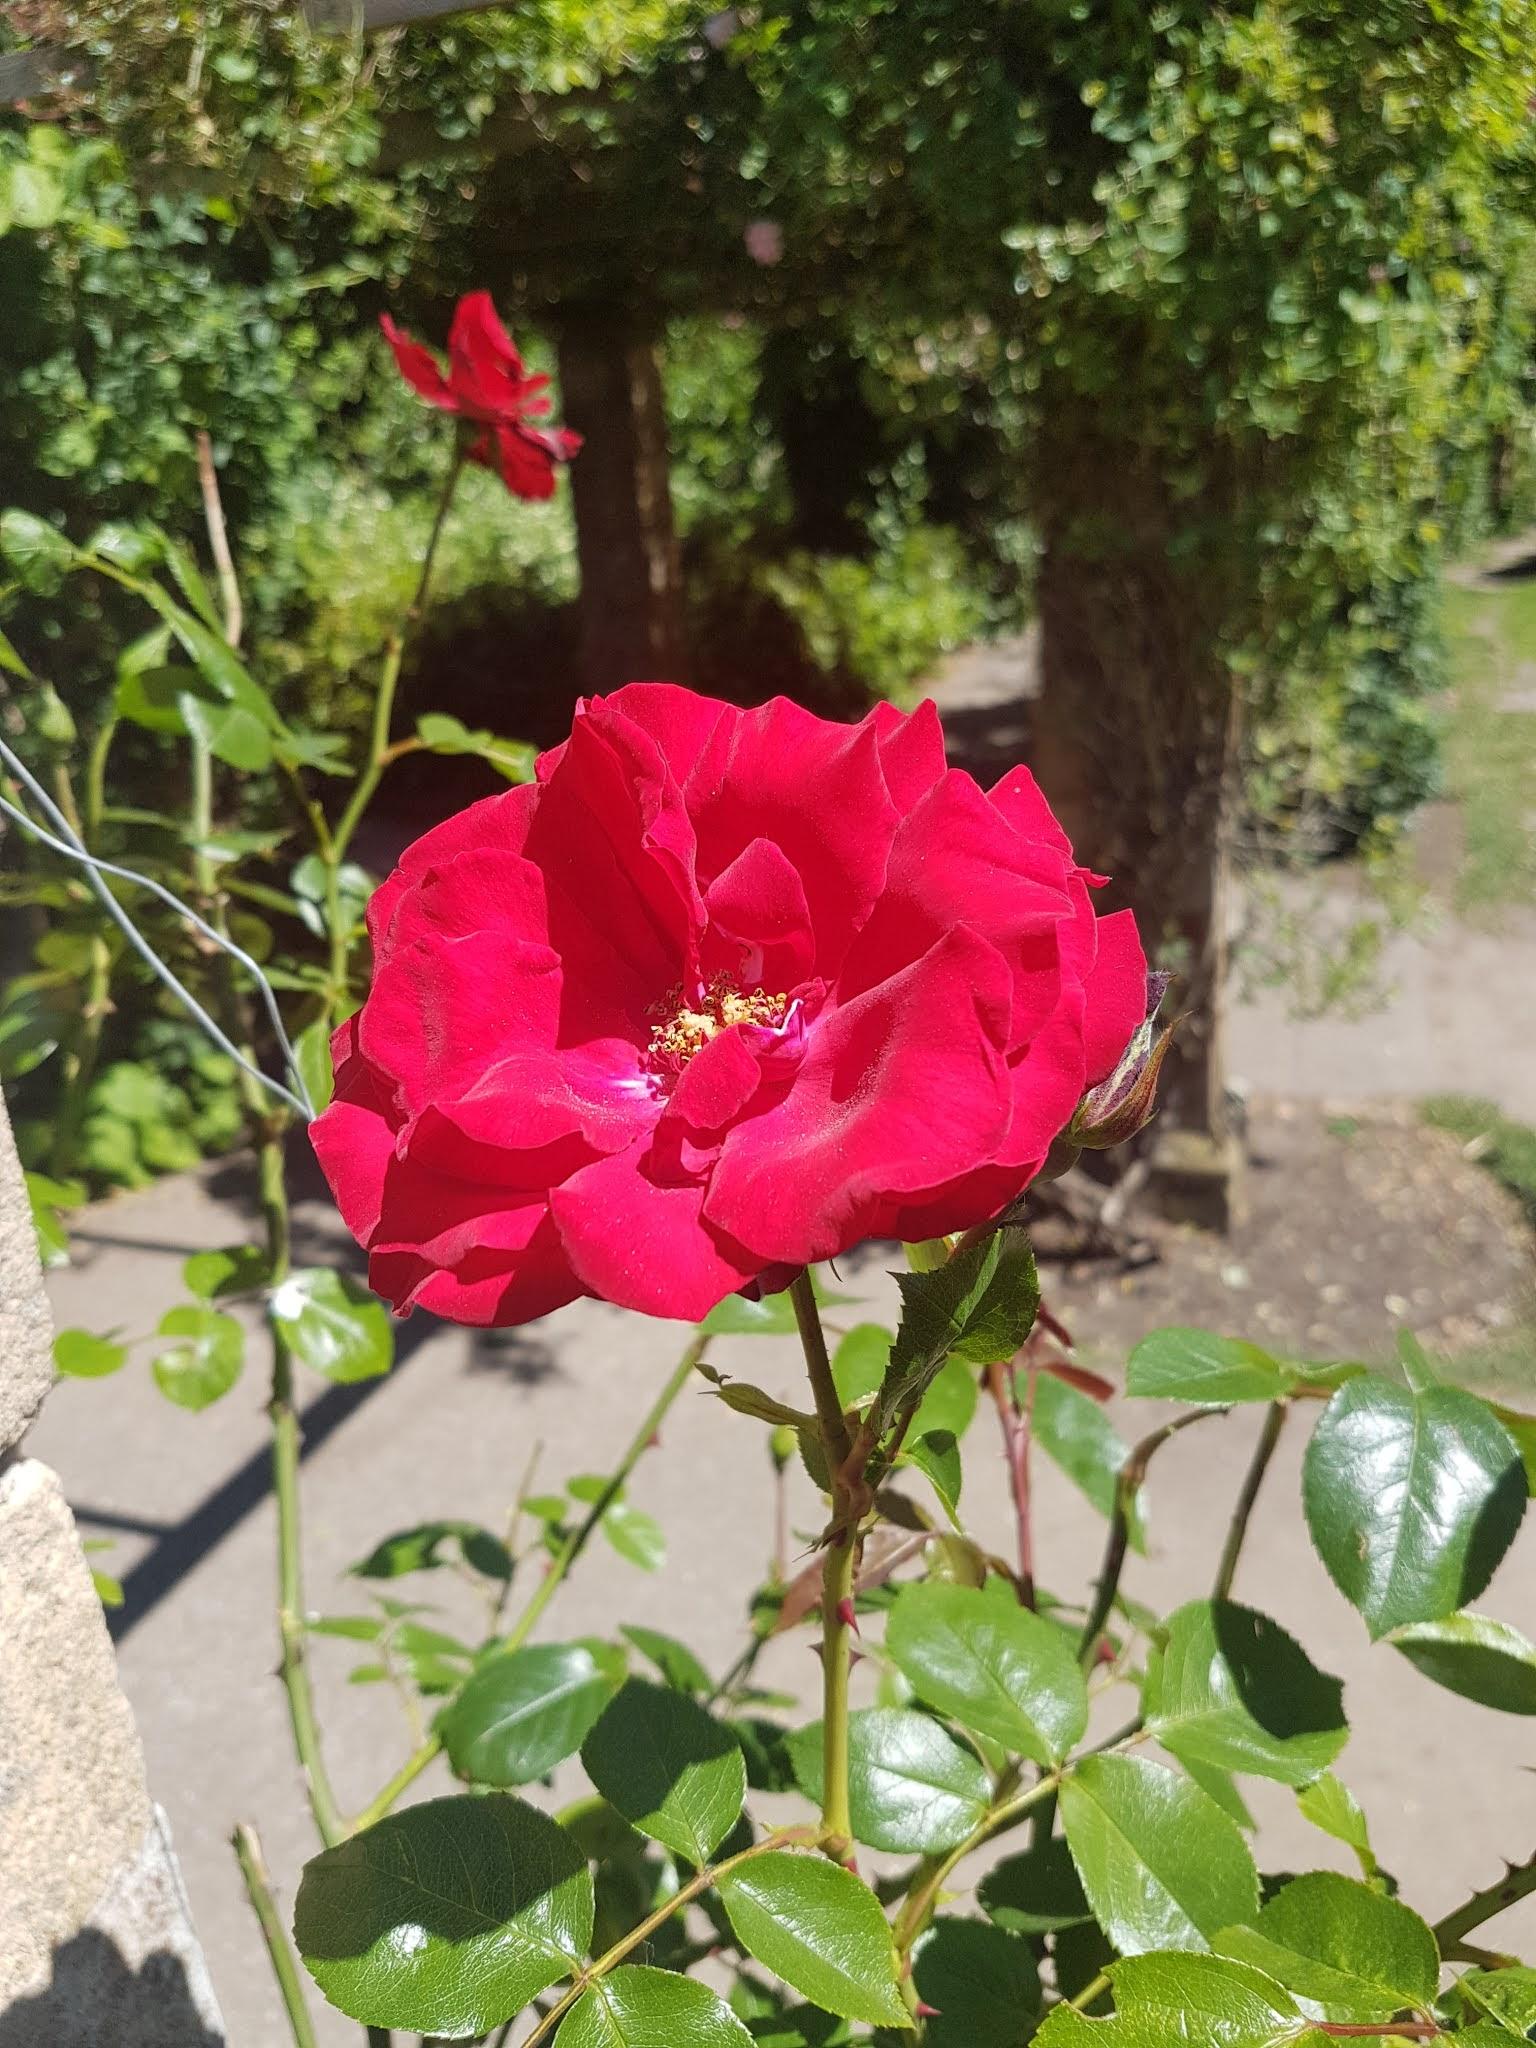 Pink flower in a mindful garden